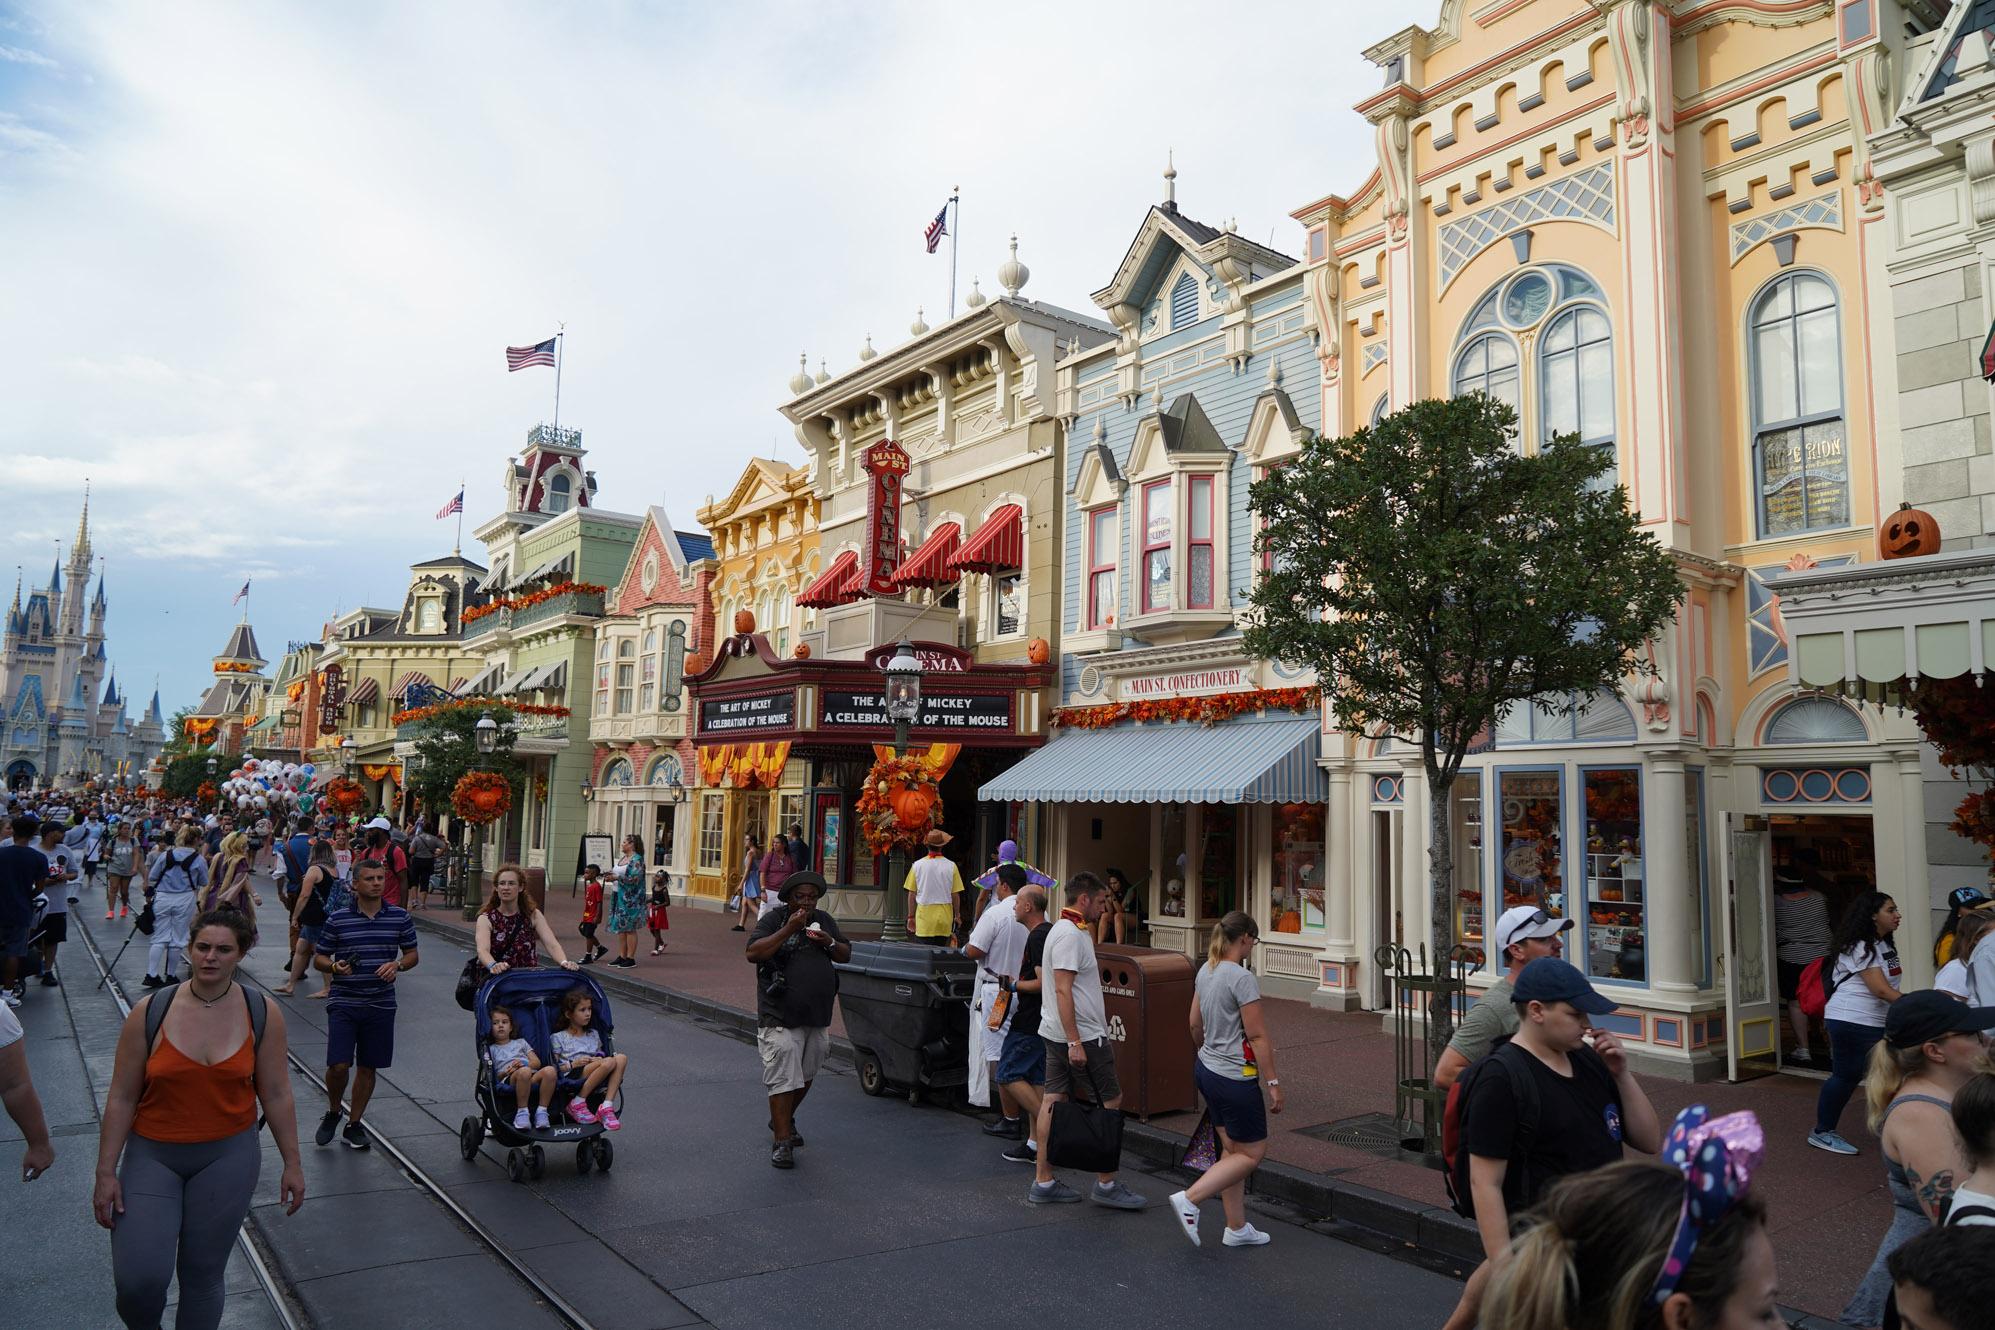 [%Disney World Map [2021 Maps: Resorts, Theme Parks, Water List Of Rides At Disney World 2021 List Of Rides At Disney World 2021%]